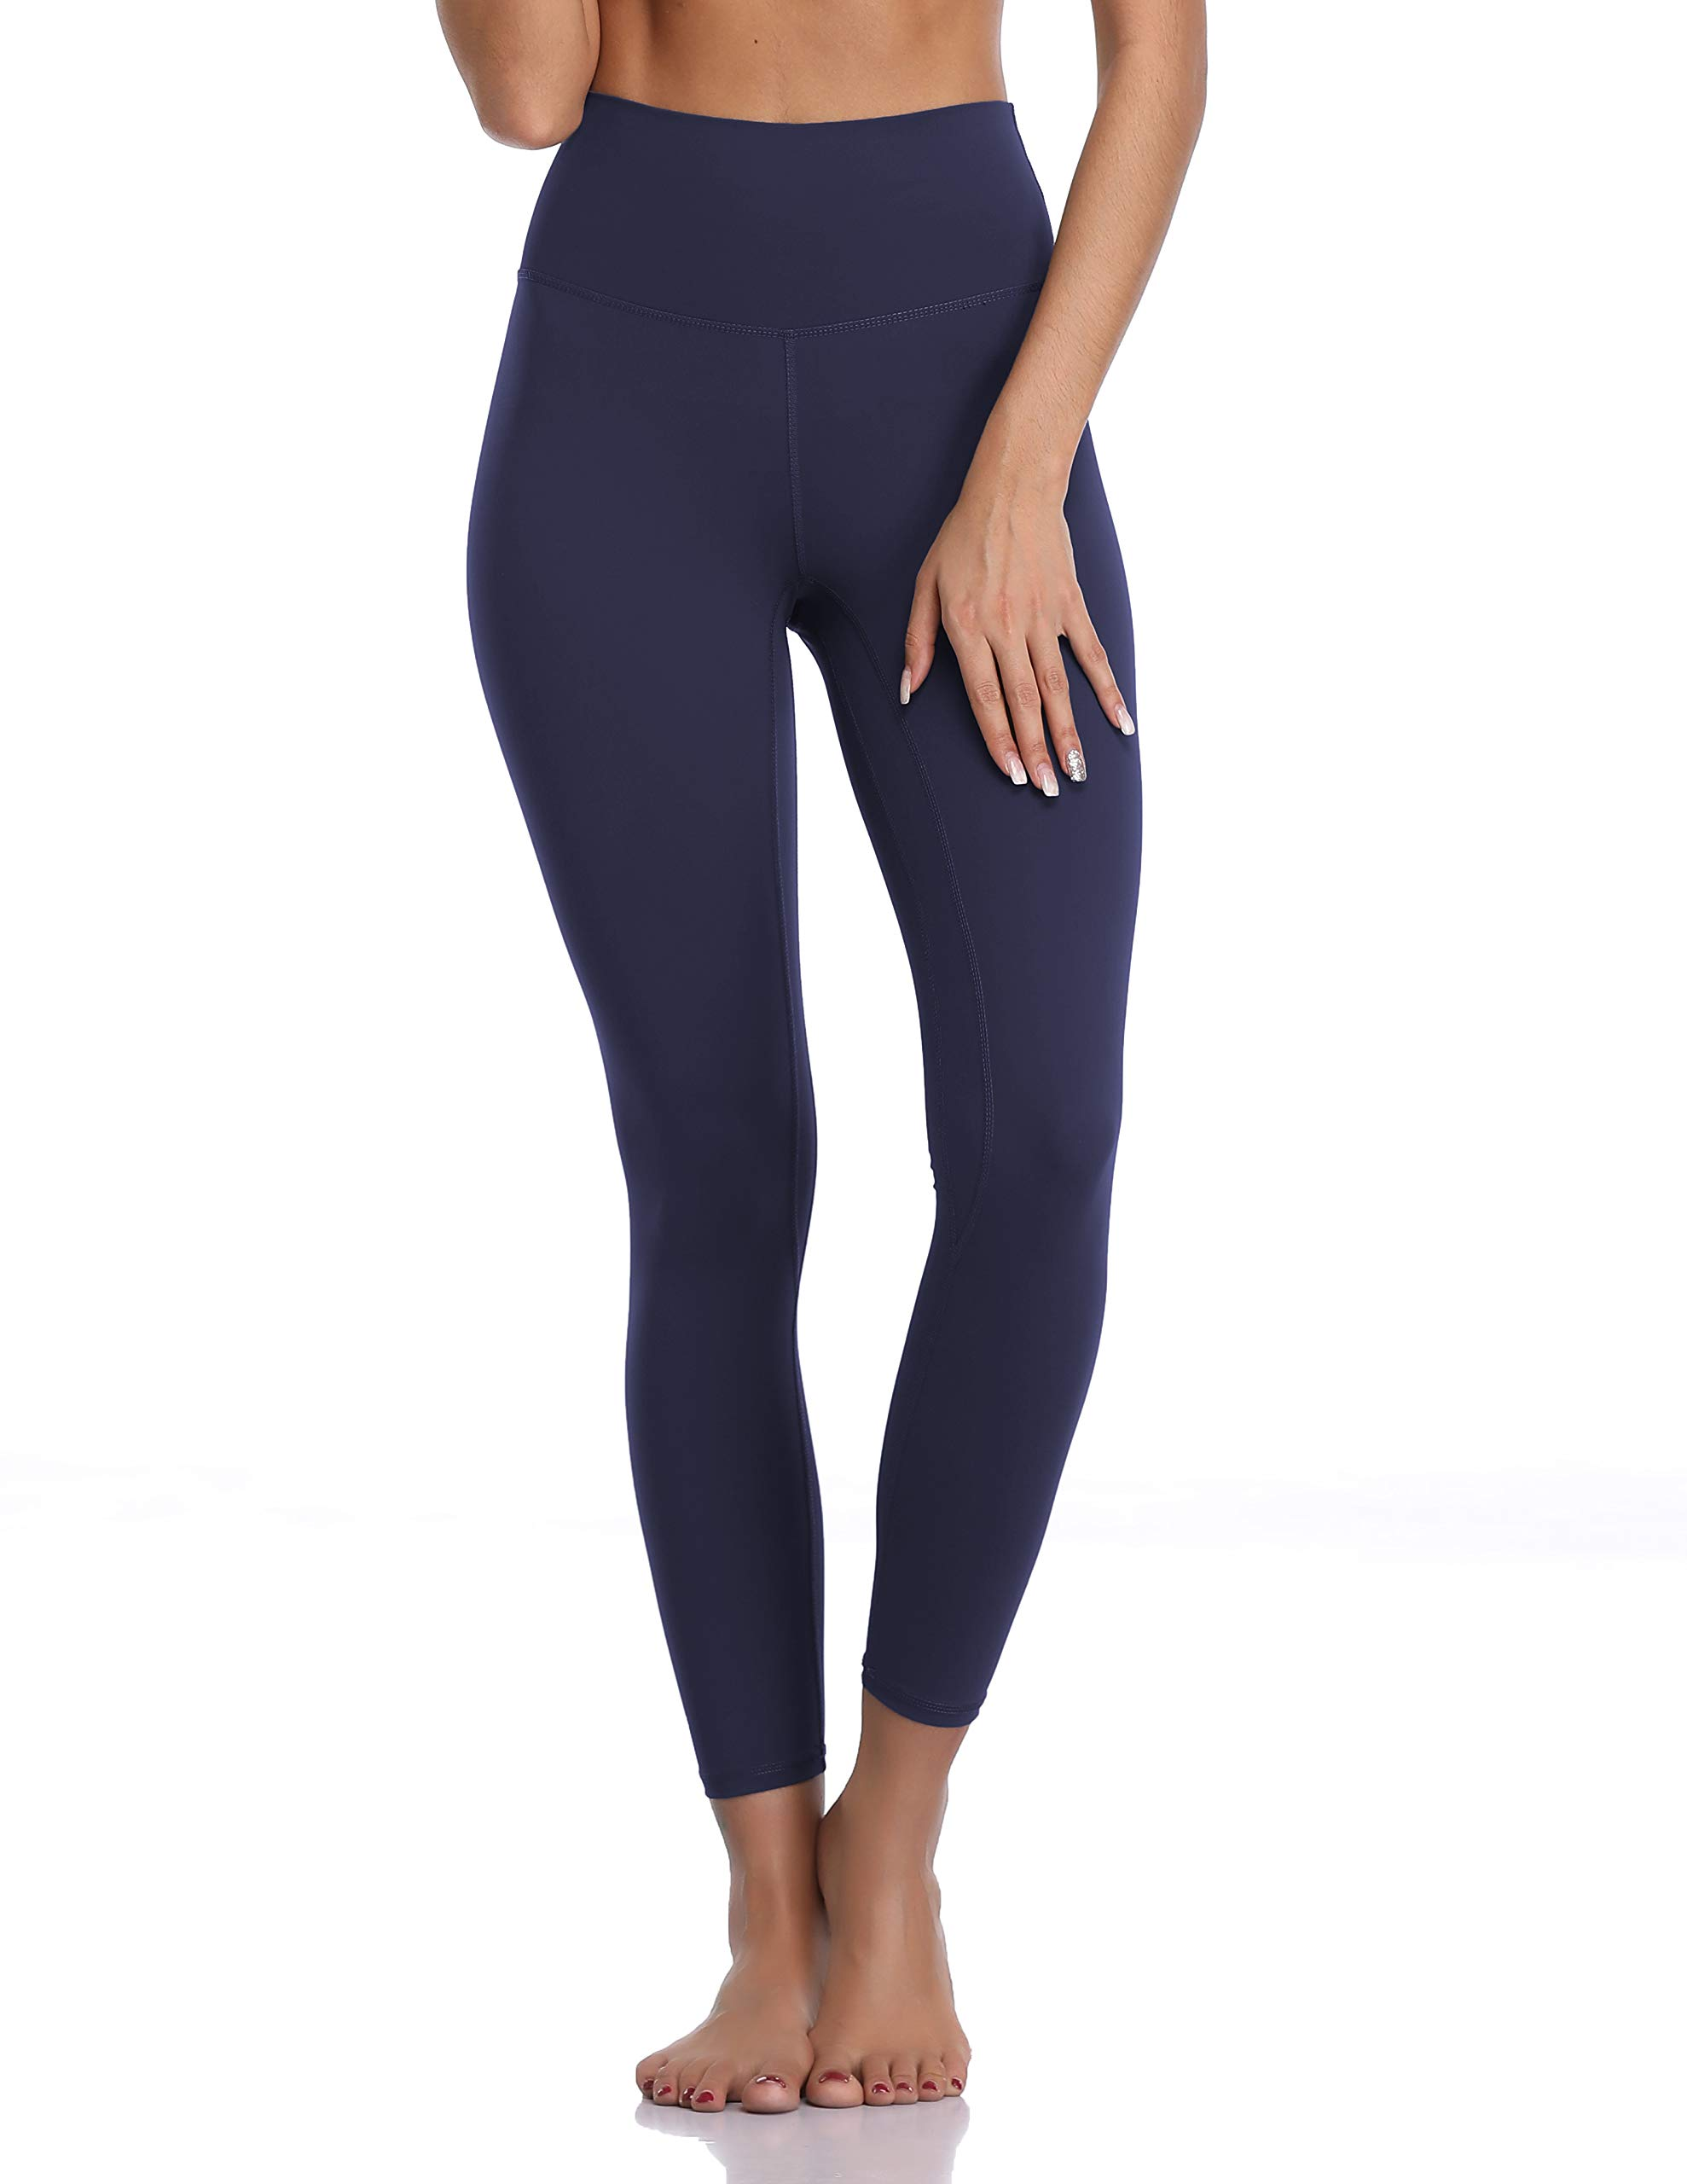 Colorfulkoala Women's Buttery Soft High Waisted Yoga Pants 7/8 Length Leggings (S, True Navy) by Colorfulkoala